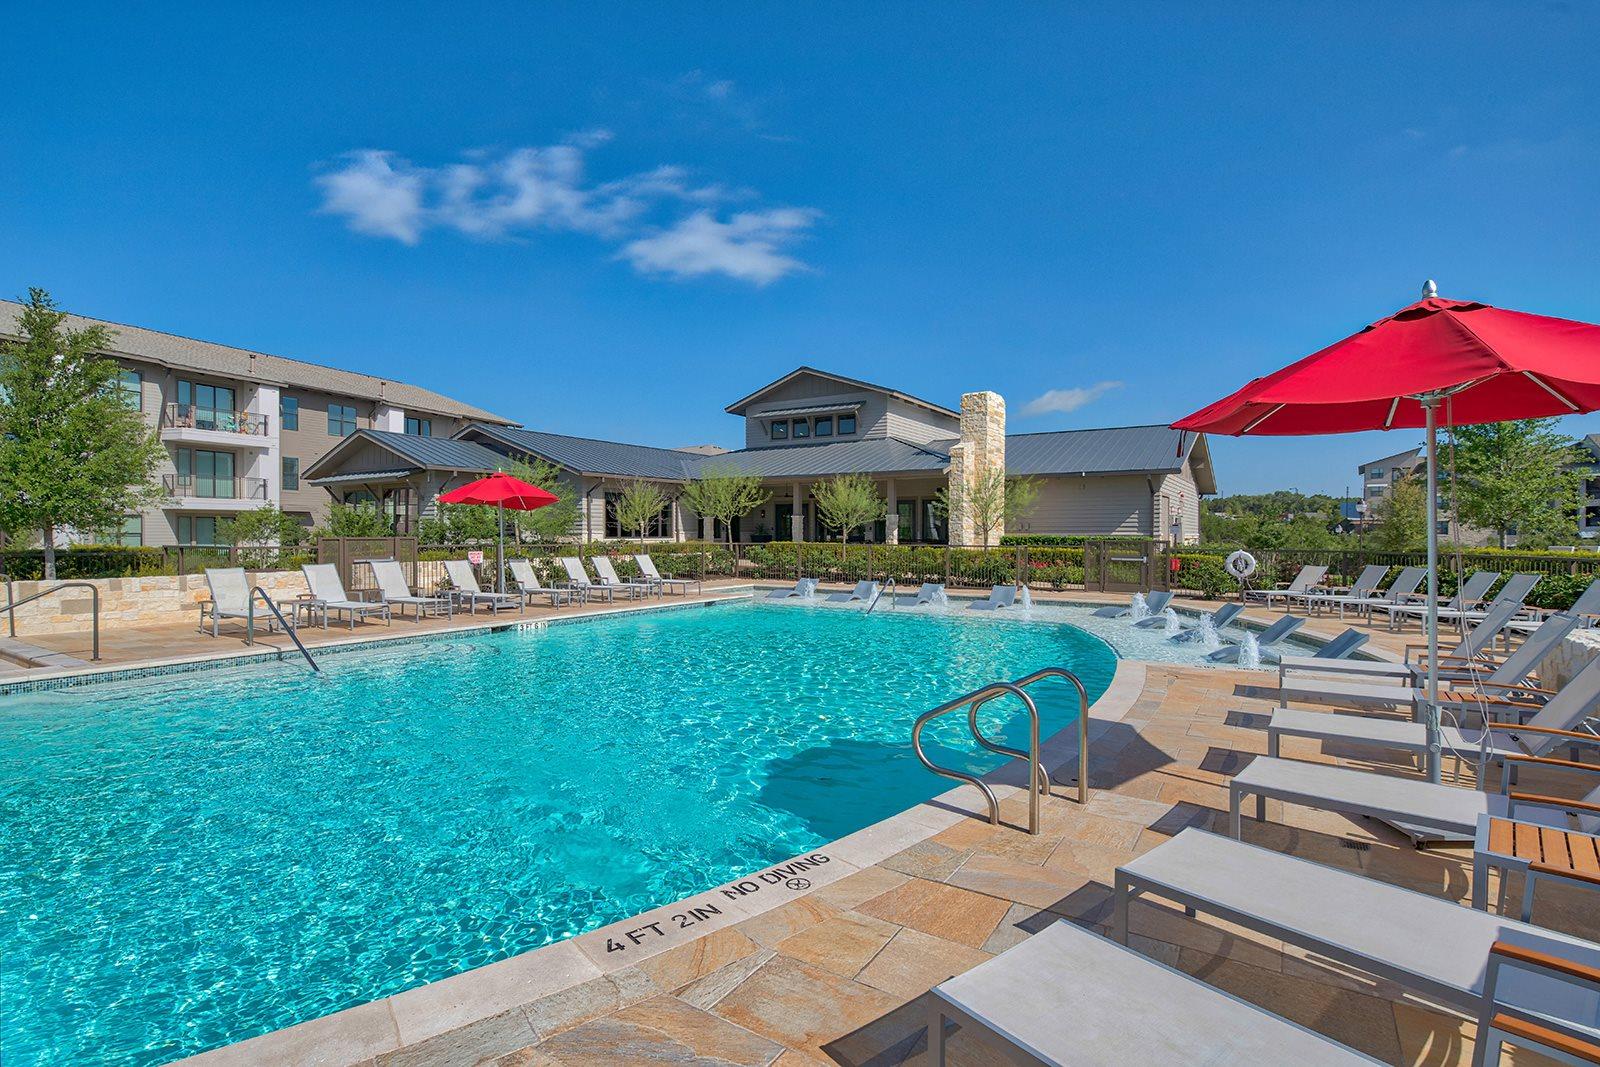 Infinity Edge Pool with Lounge Chairs at Windsor Lantana Hills, 78735, TX